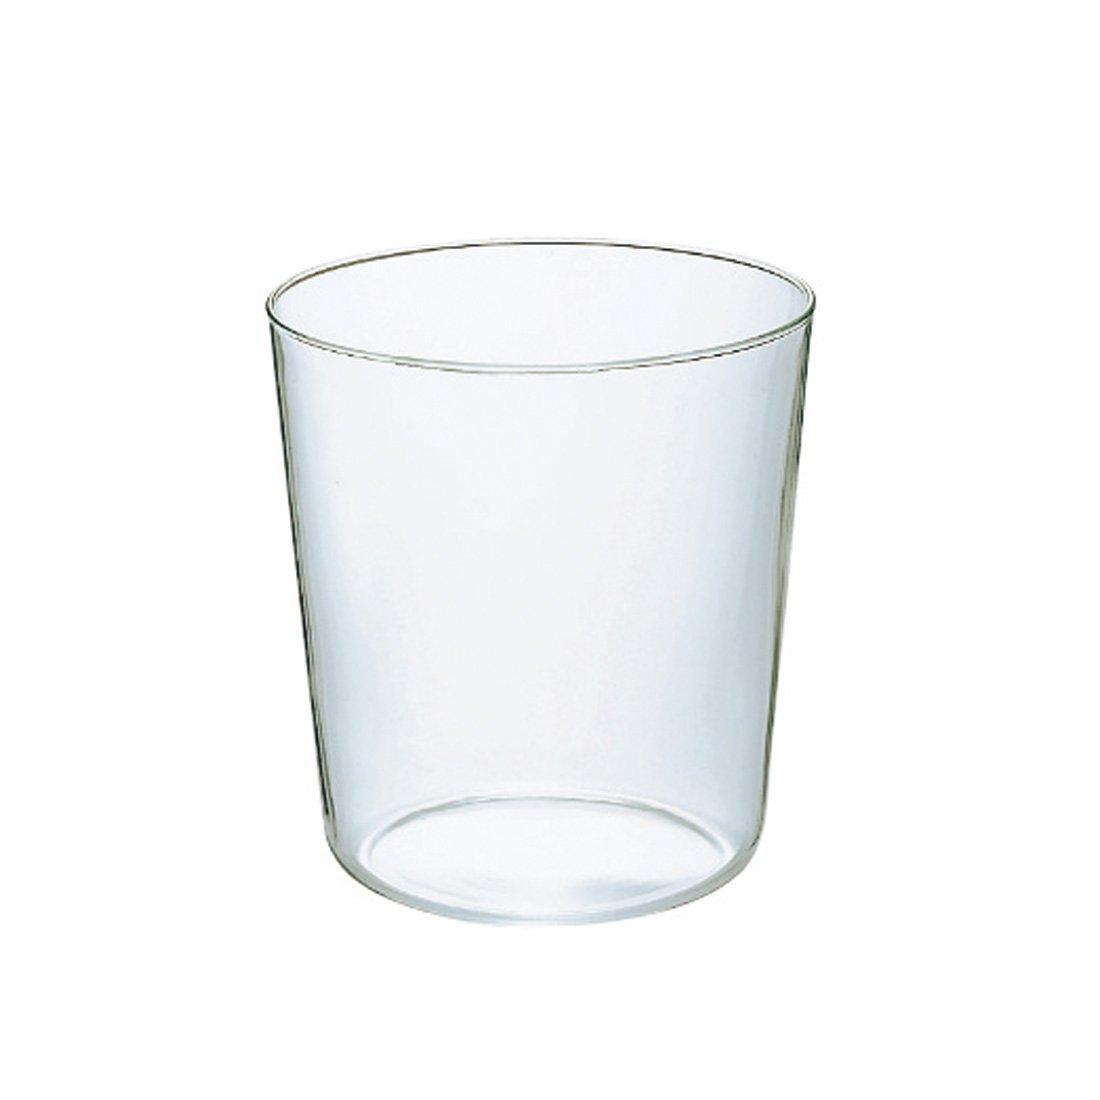 Hario heat rocks glass 300ml RG-300 (japan import)